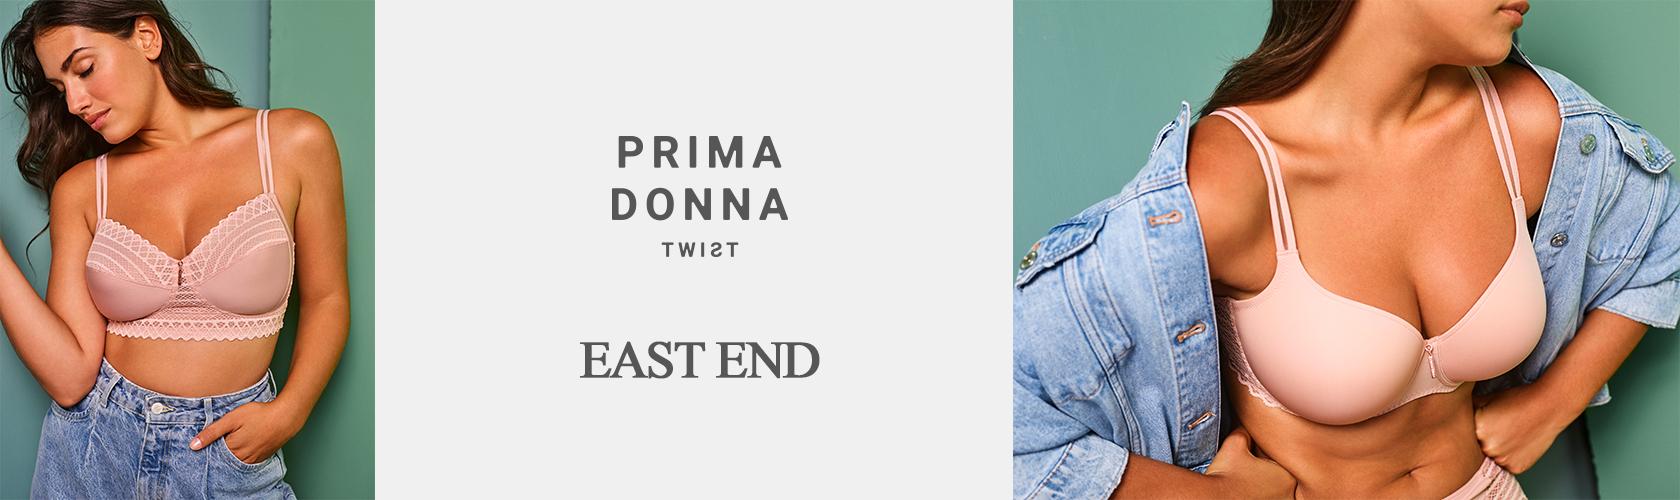 2020000927 Slideshow East End PWD 23.04.2021